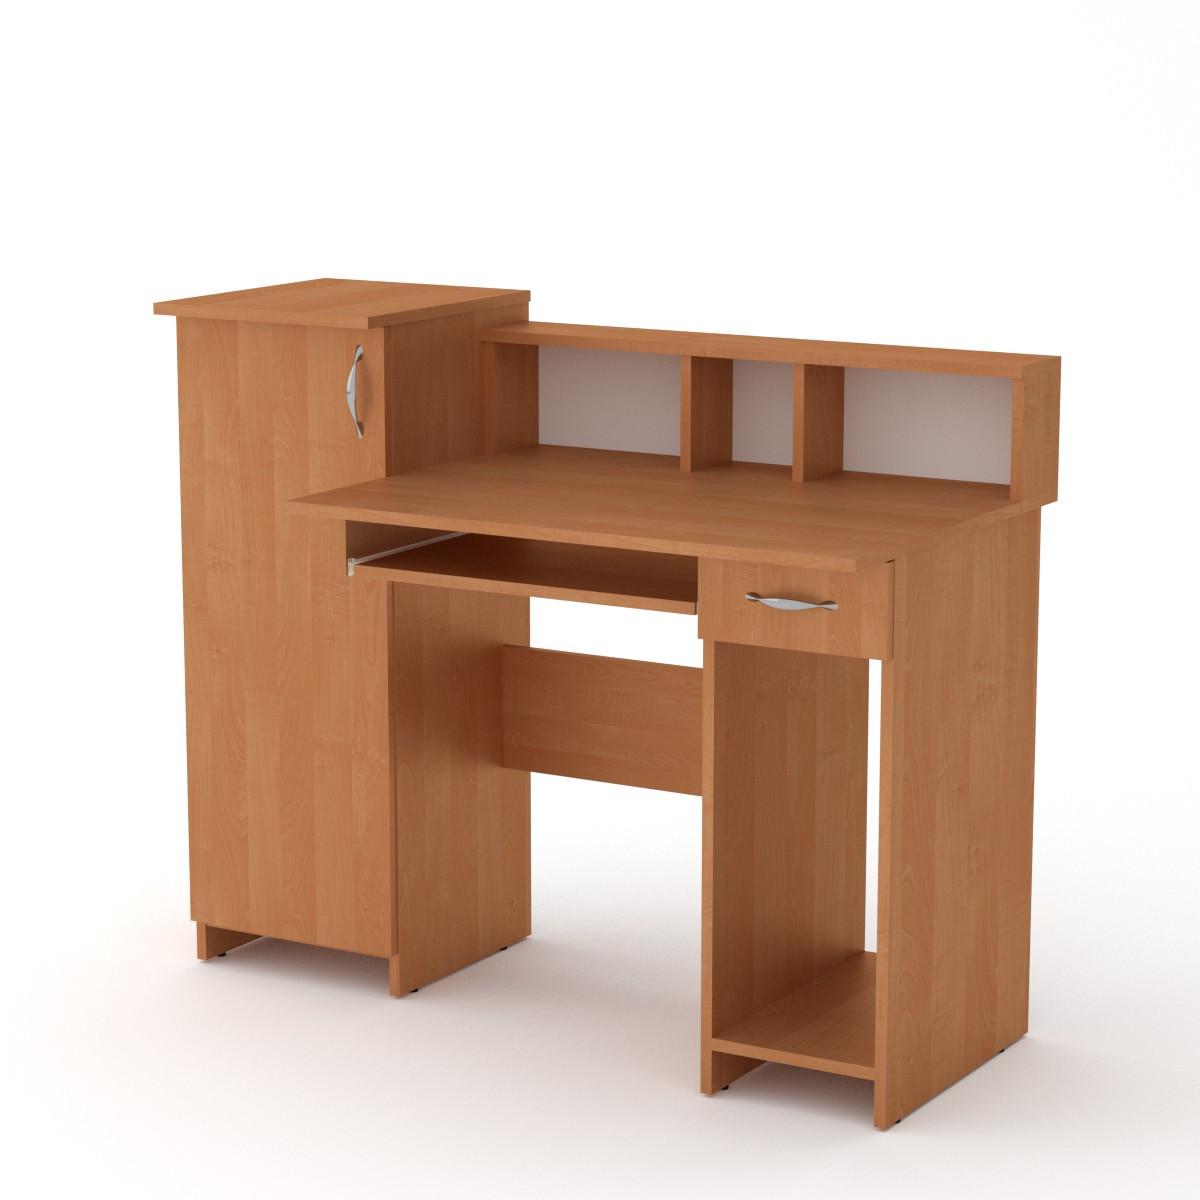 Стол компьютерный пи пи-2 ольха Компанит (118х60х96 см)